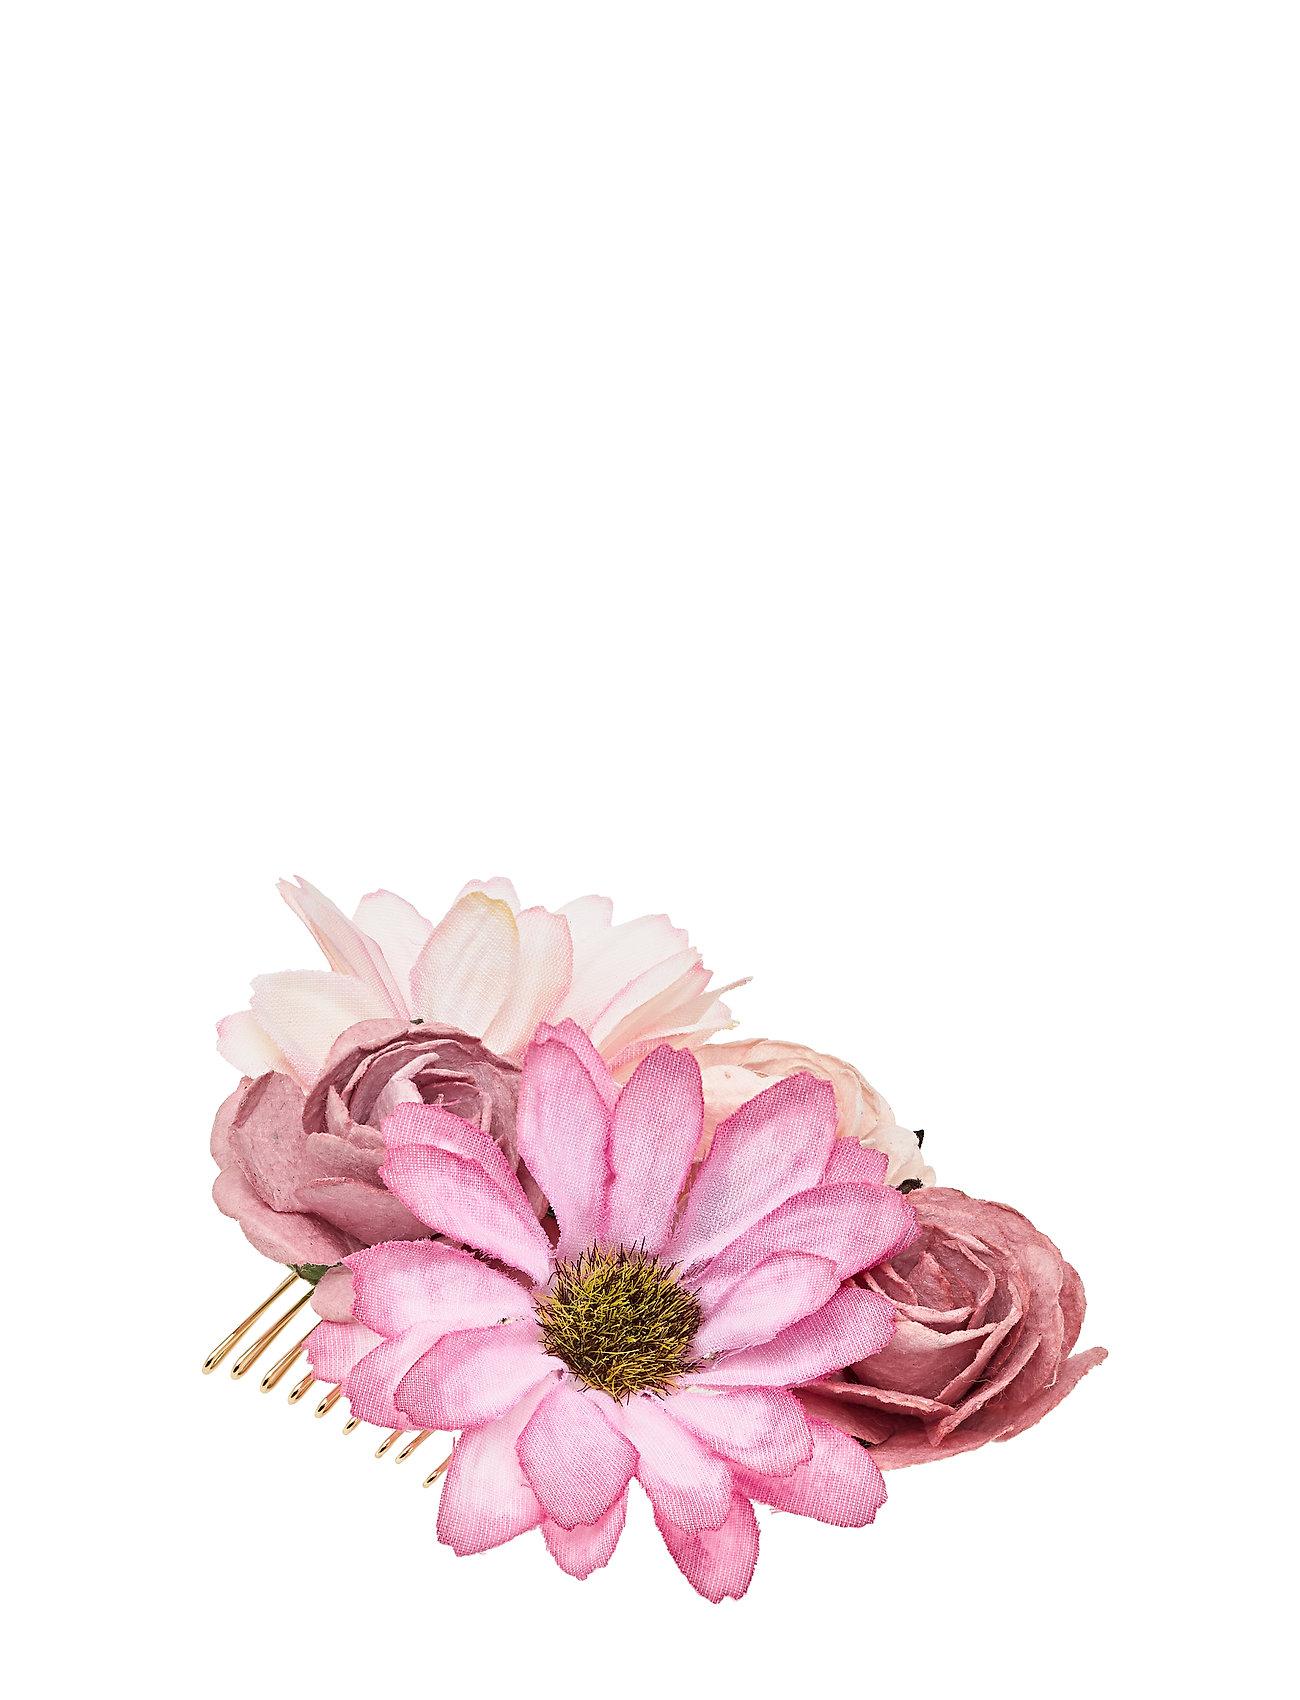 Image of Petite Rosie Hairpiece - Vintage Rose Hårtilbehør Lyserød LILY AND ROSE (3364041745)